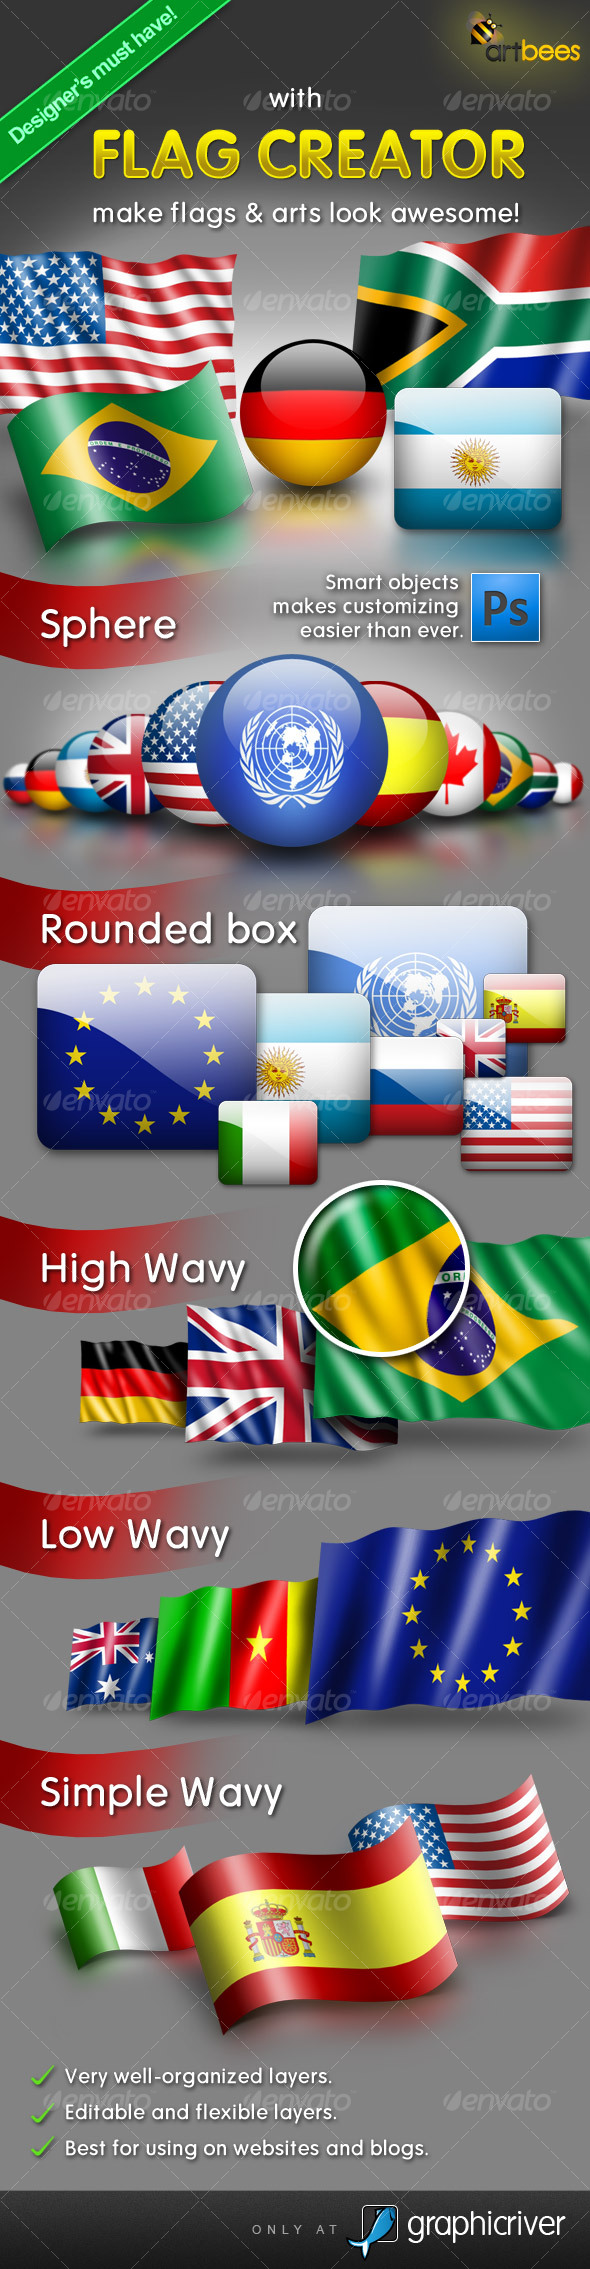 Flag Creator Free Download #1 free download Flag Creator Free Download #1 nulled Flag Creator Free Download #1